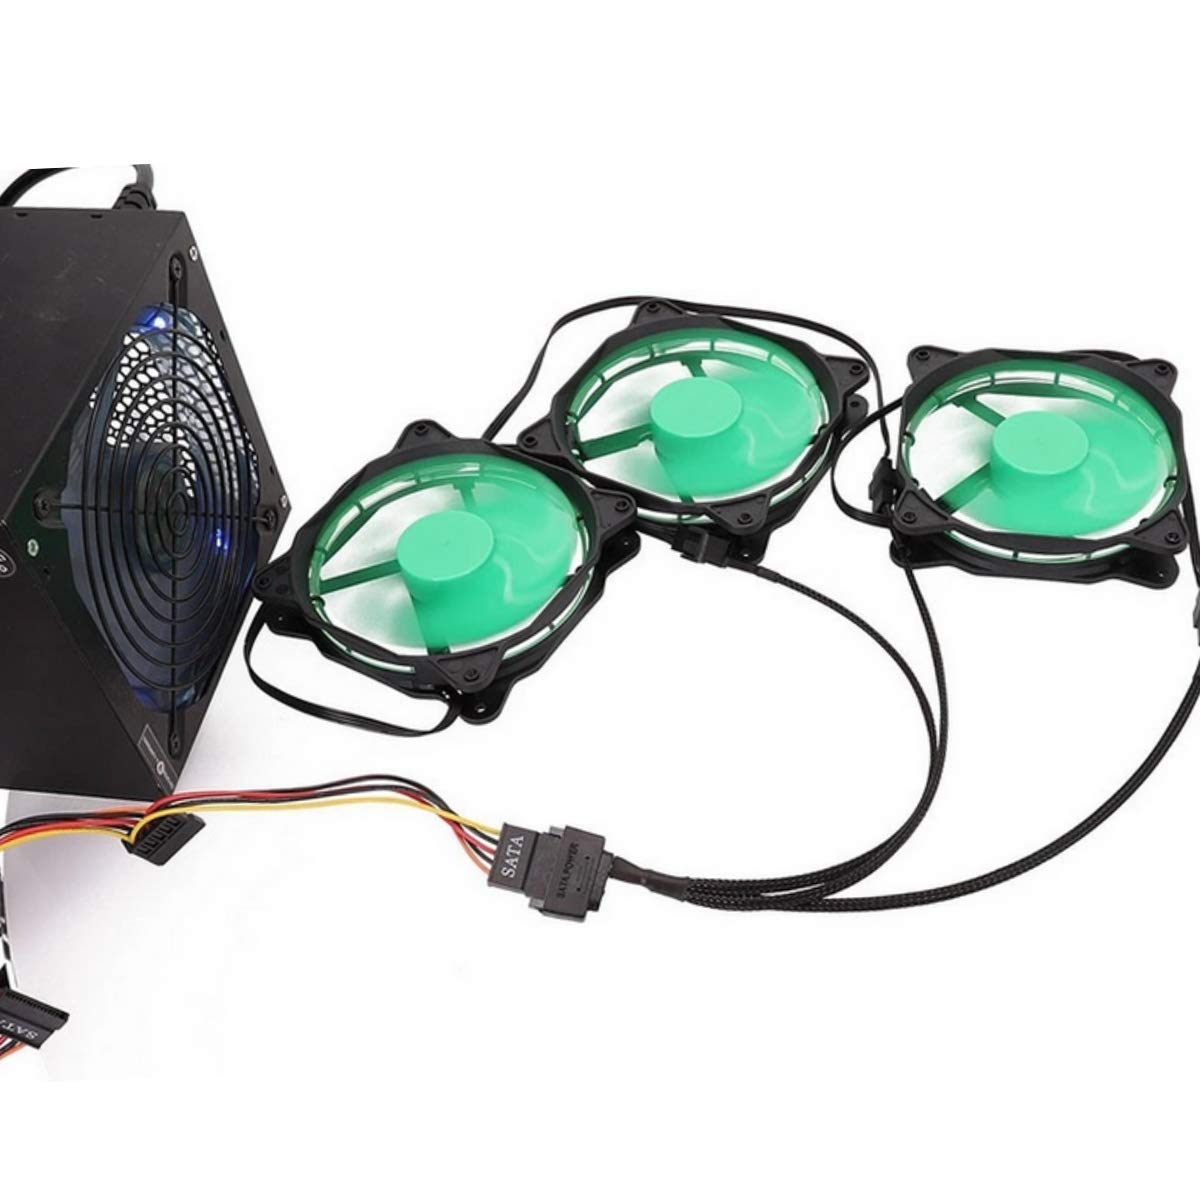 K/ühler L/üfter Adapter Kabel 15 Pin SATA auf 3 x 3 Pin // 4 Pin PMW 12V PC-Geh/äusel/üfter Stromadapterkabel, auf 15 Pin SATA Computerk/ühler K/ühlung L/üfter Splitter Y Stromkabel PWM-Anschluss